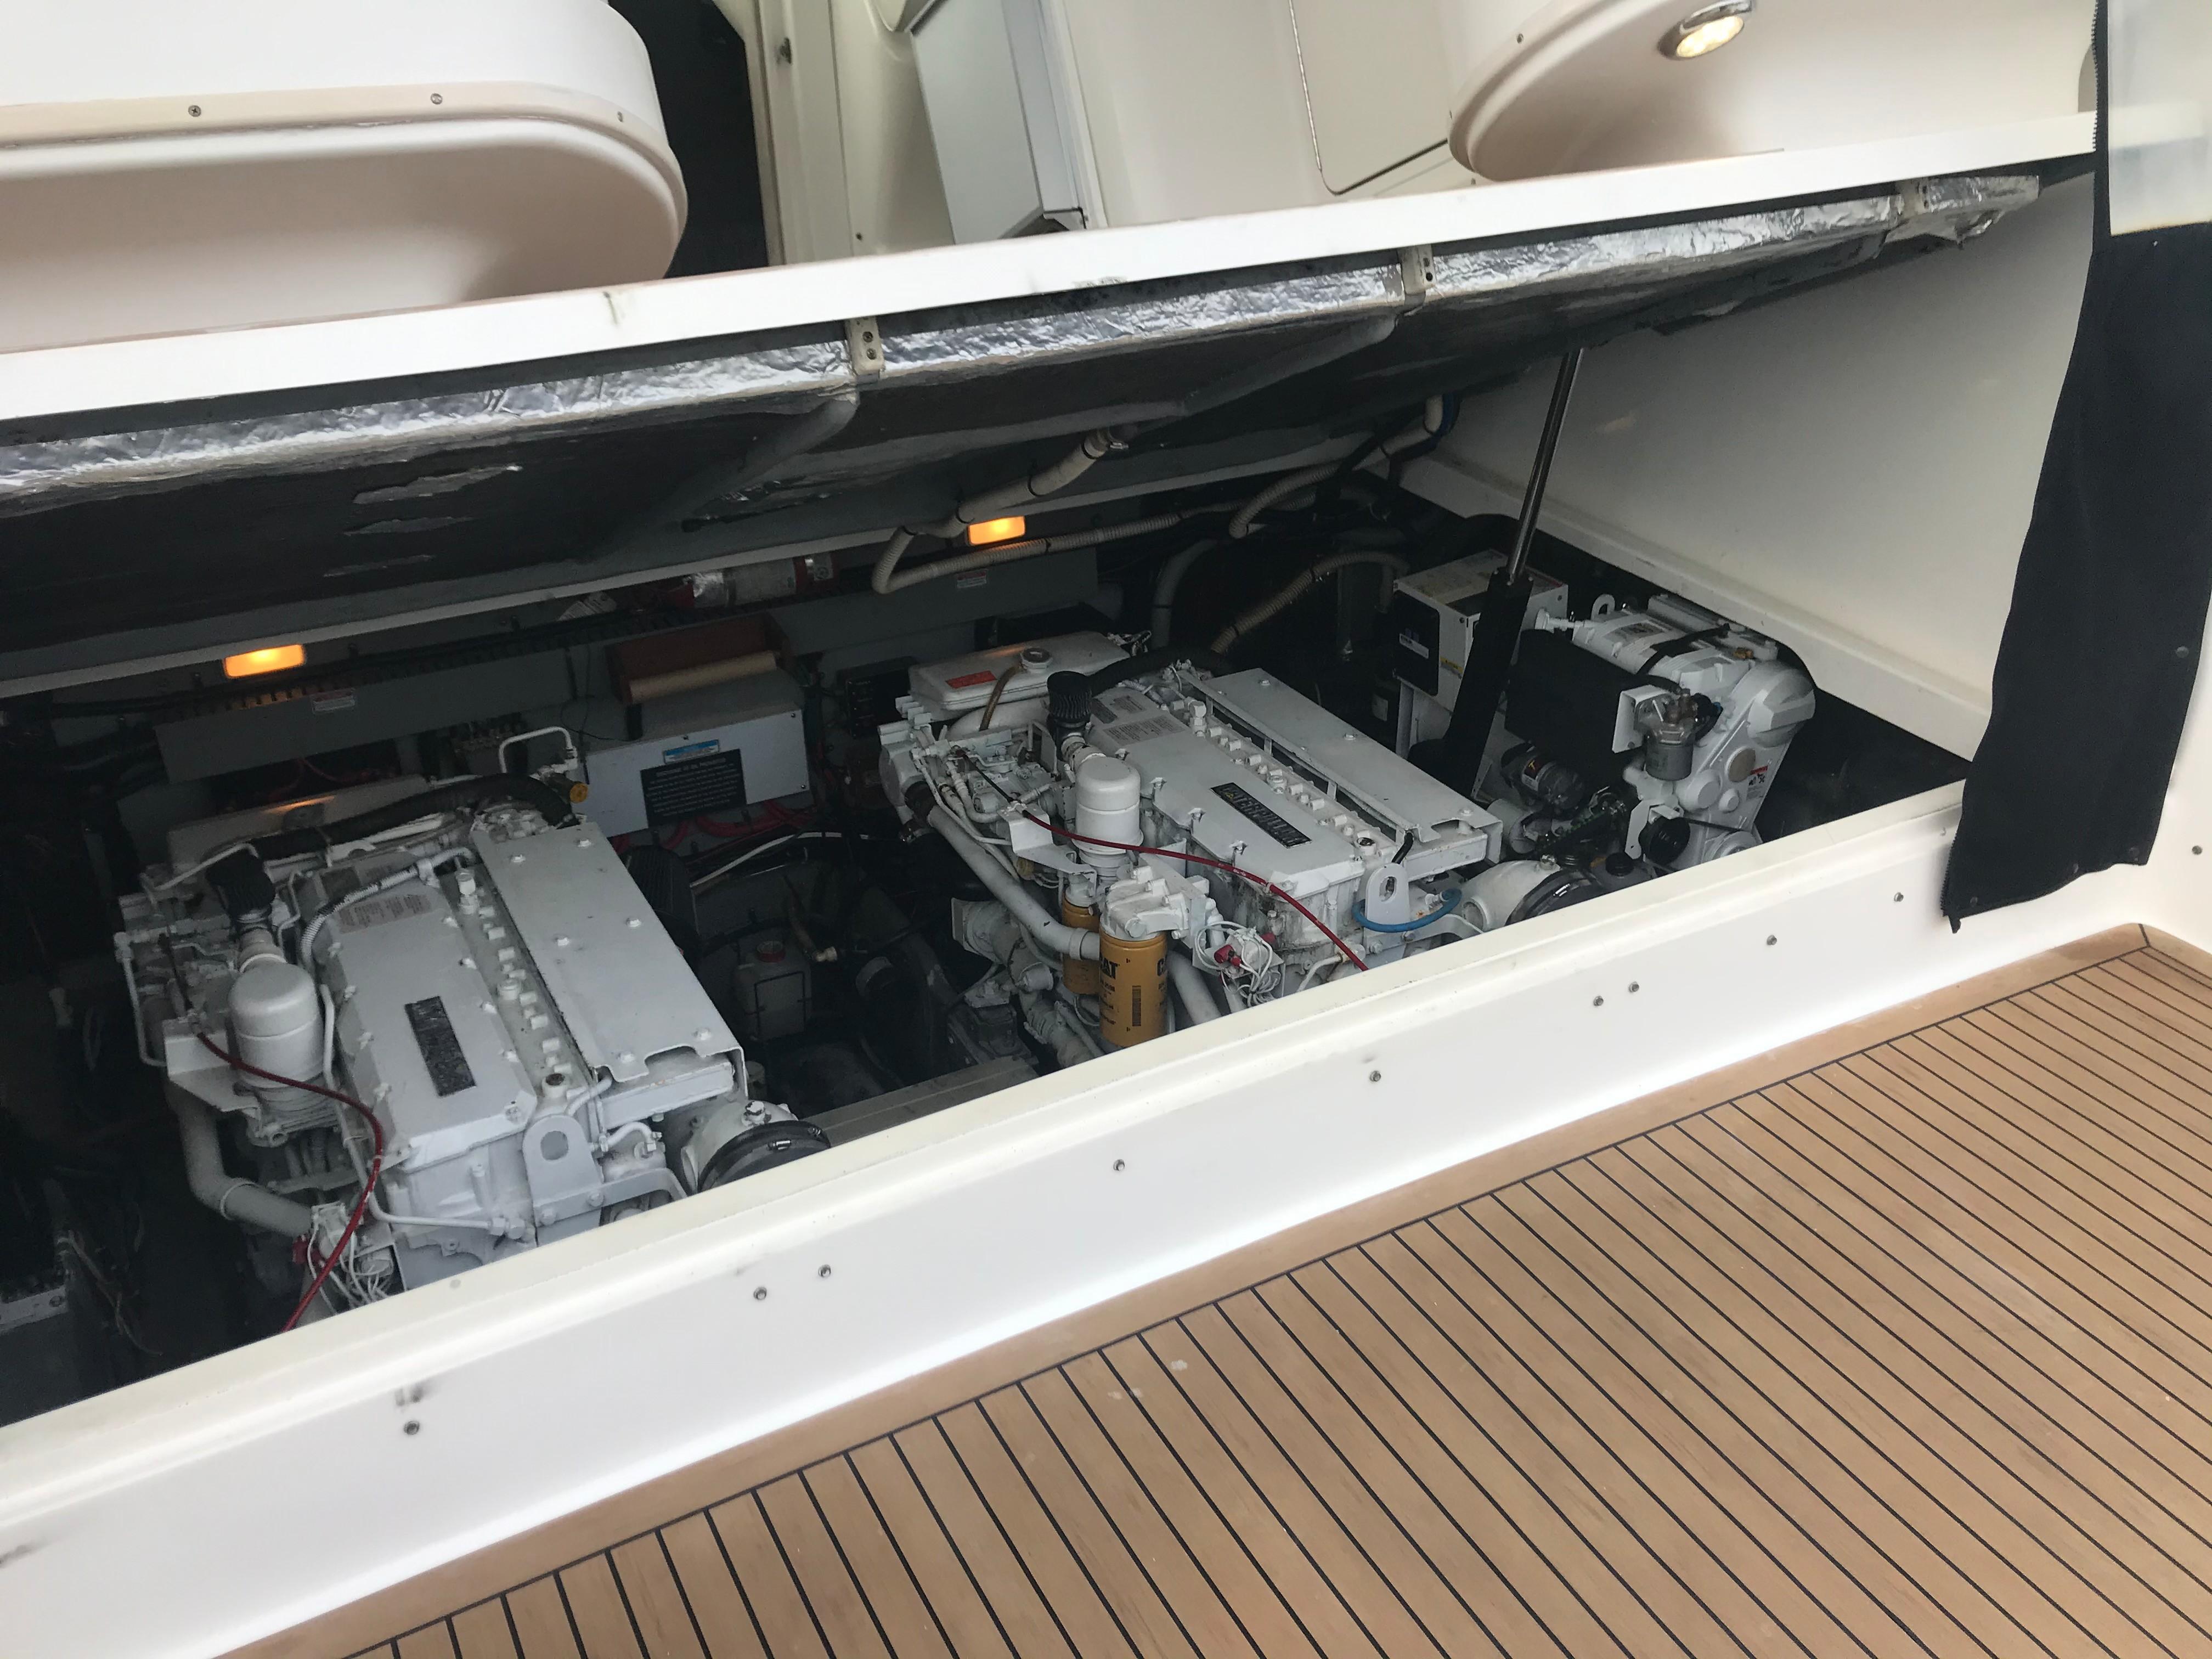 Sea Ray 370 Express Cruiser - Helm Deck Raises Hydraulically